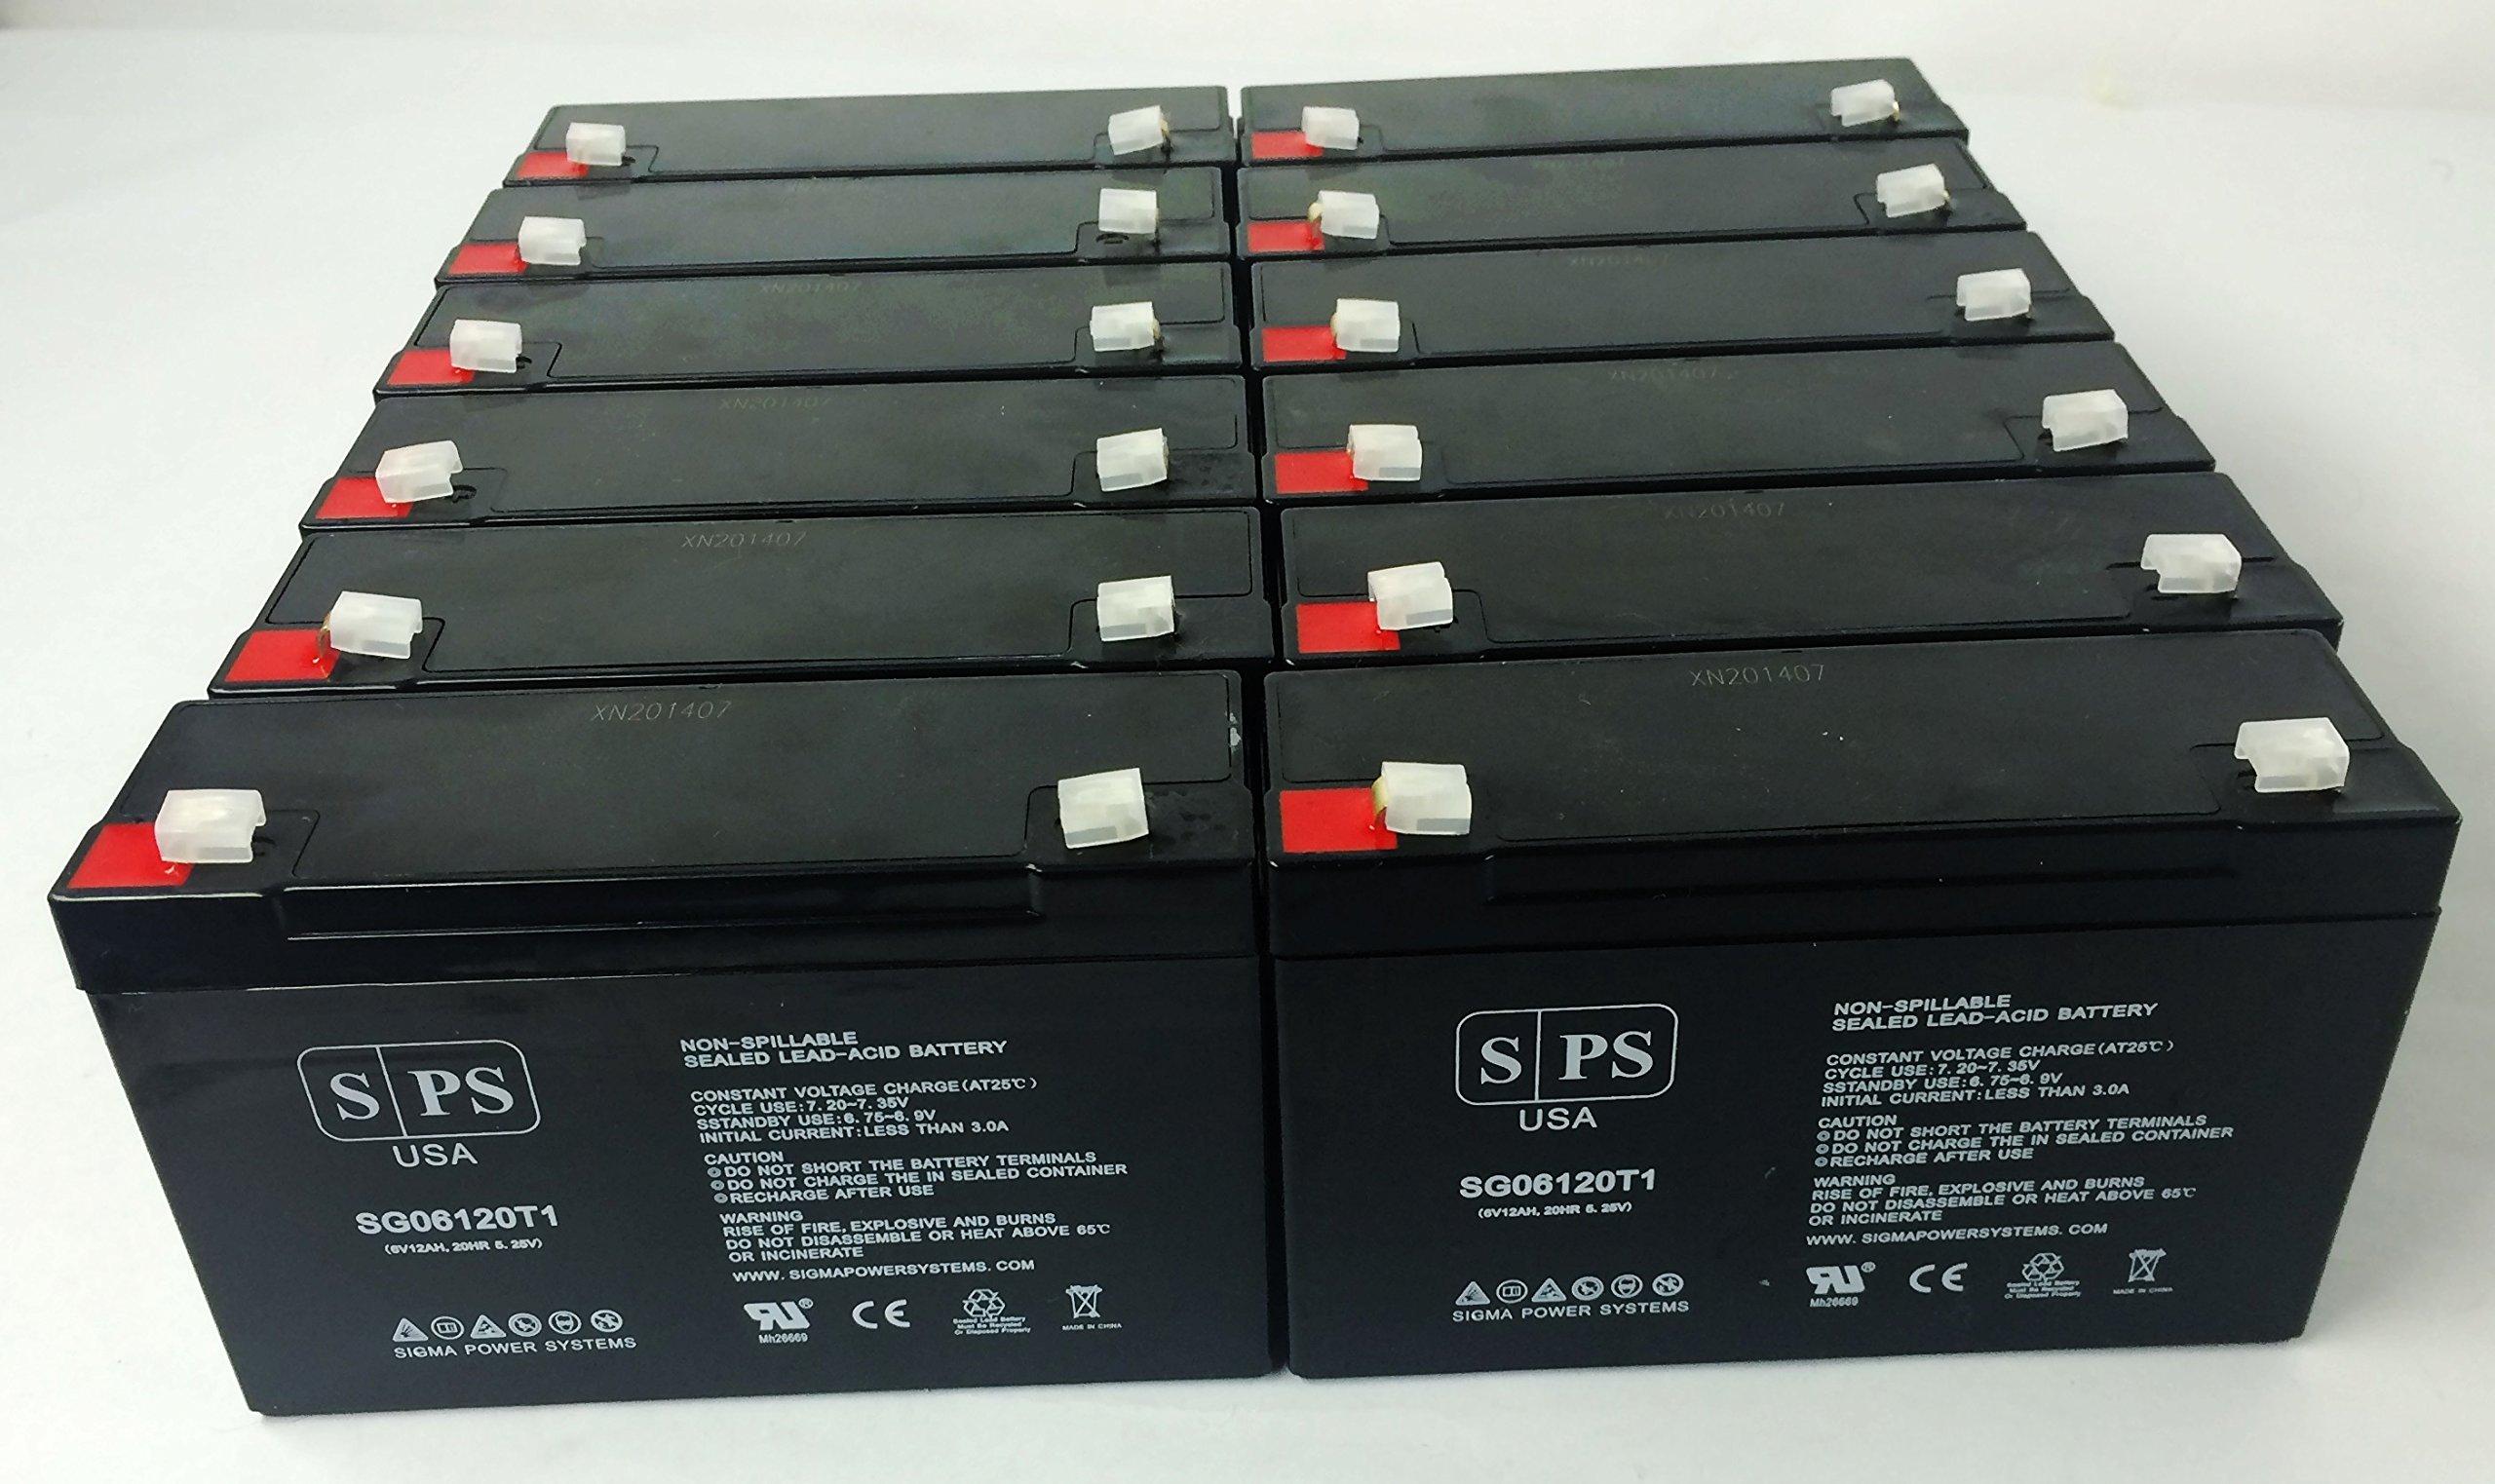 6V 12Ah Lithonia ELB0612 6V 12Ah Emergency Light Replacement Battery - SPS BRAND (12 Pack)